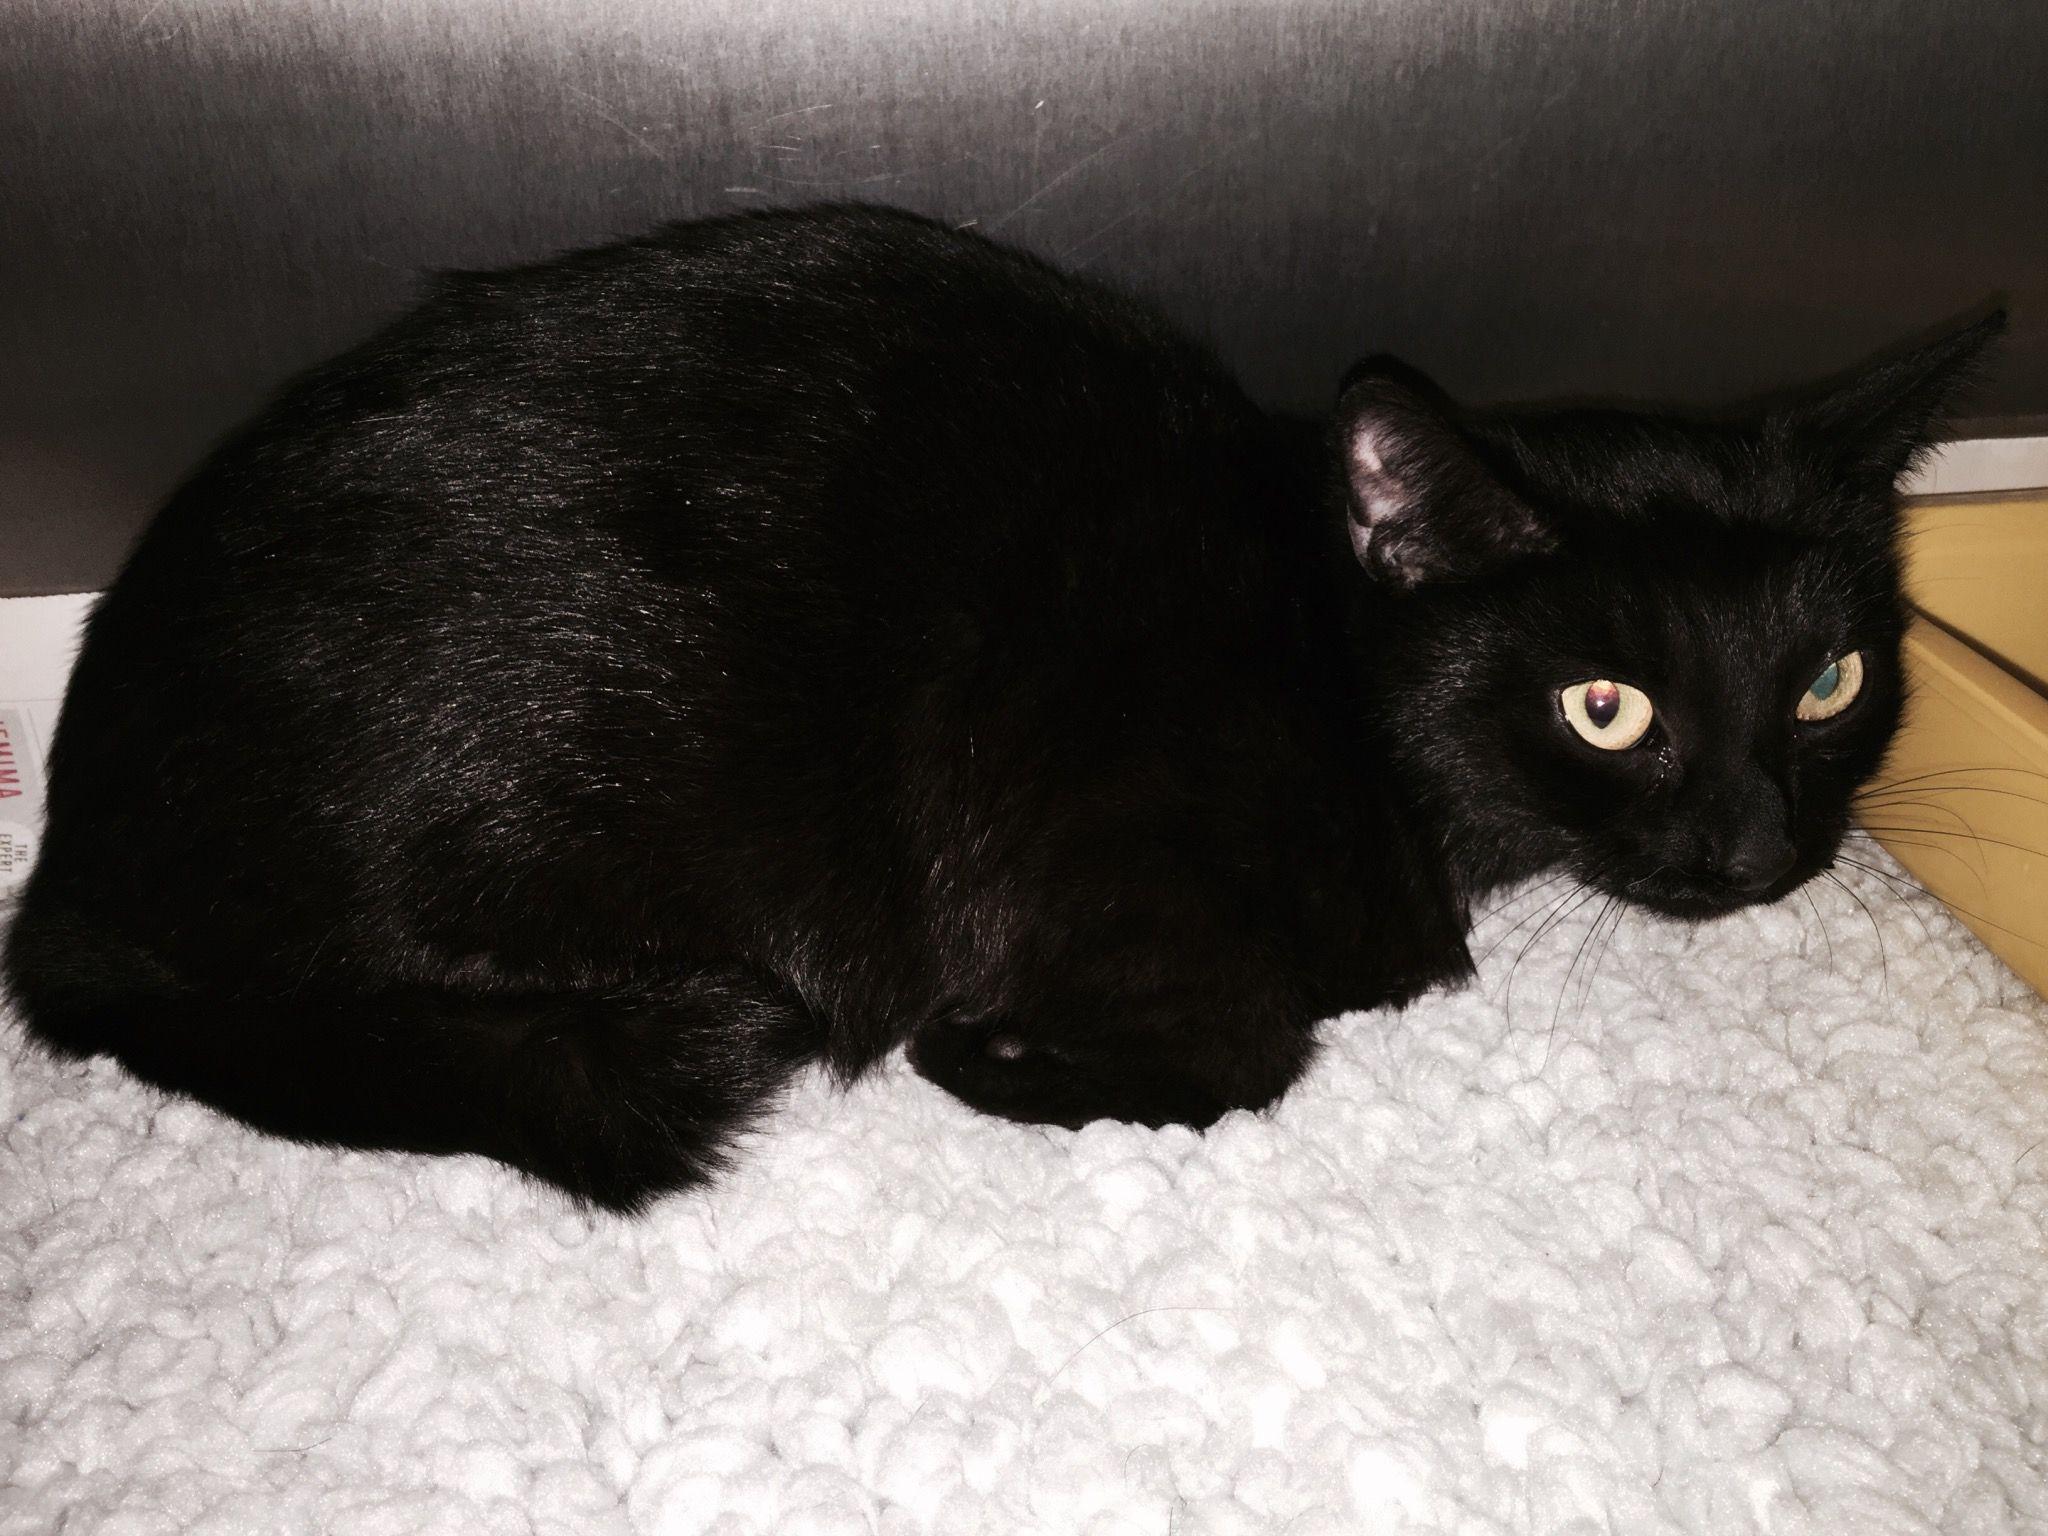 (4/2/15) Young black female cat, found near Brandon